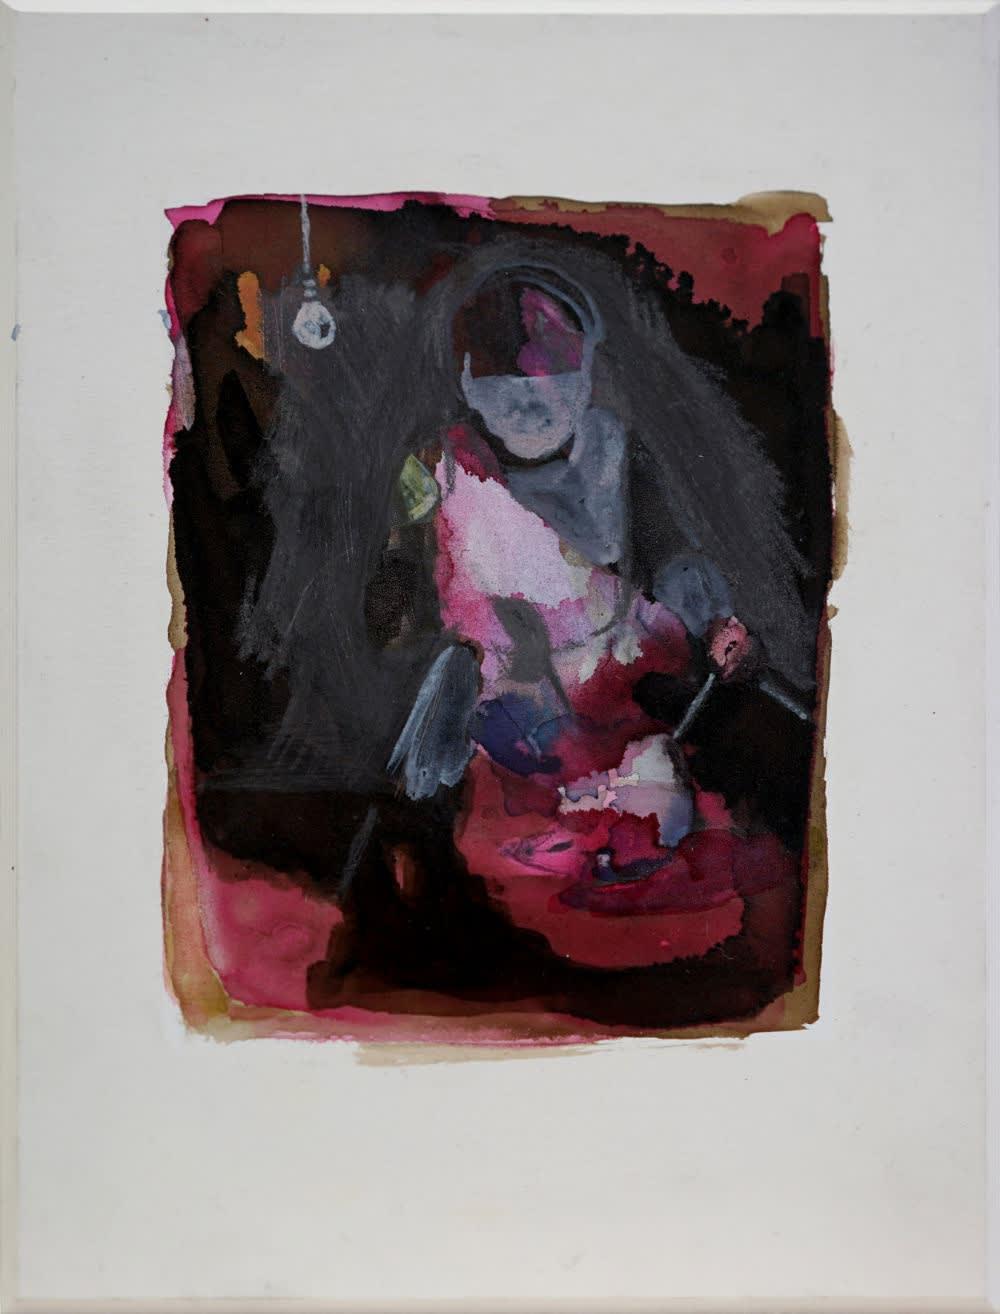 ANNA BITTERSOHL - UNTERSUCHUNG MIT LICHT - 2016 - INK AND PENCIL ON CARTON - 19,5 X 14,5 CM